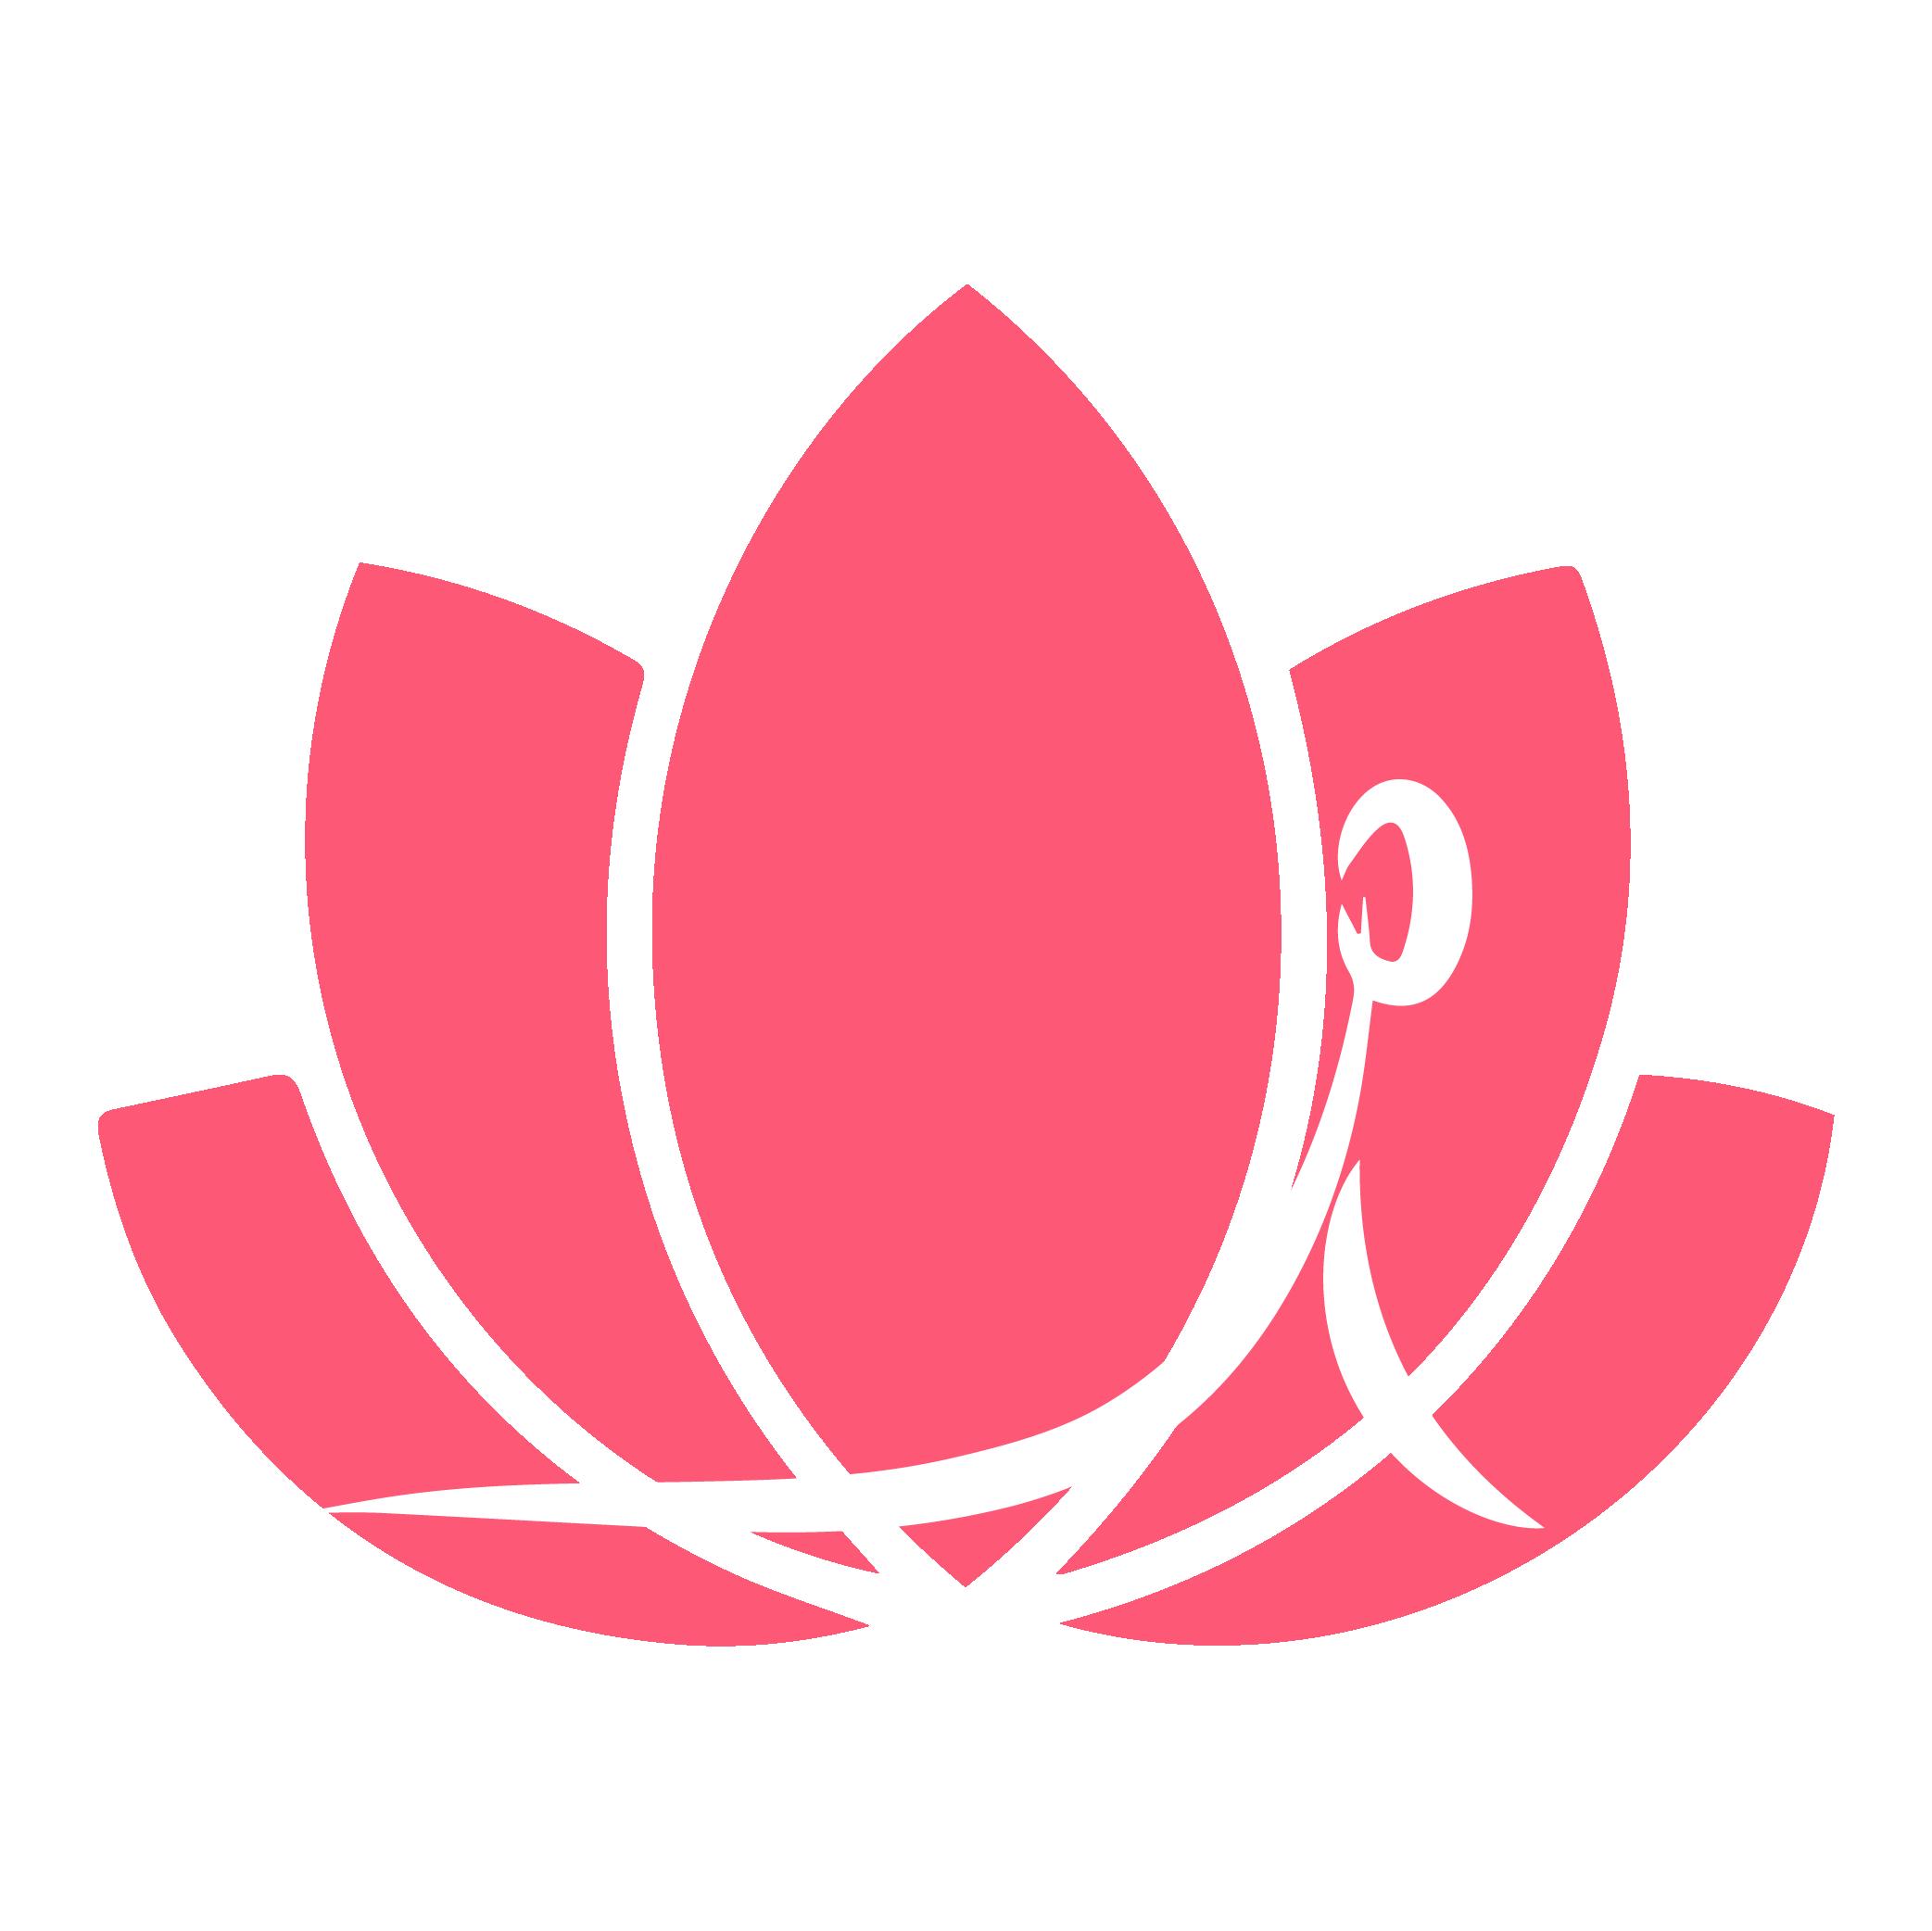 https://kamlayoga.com/wp-content/uploads/2020/03/logo-yin-yoga.png